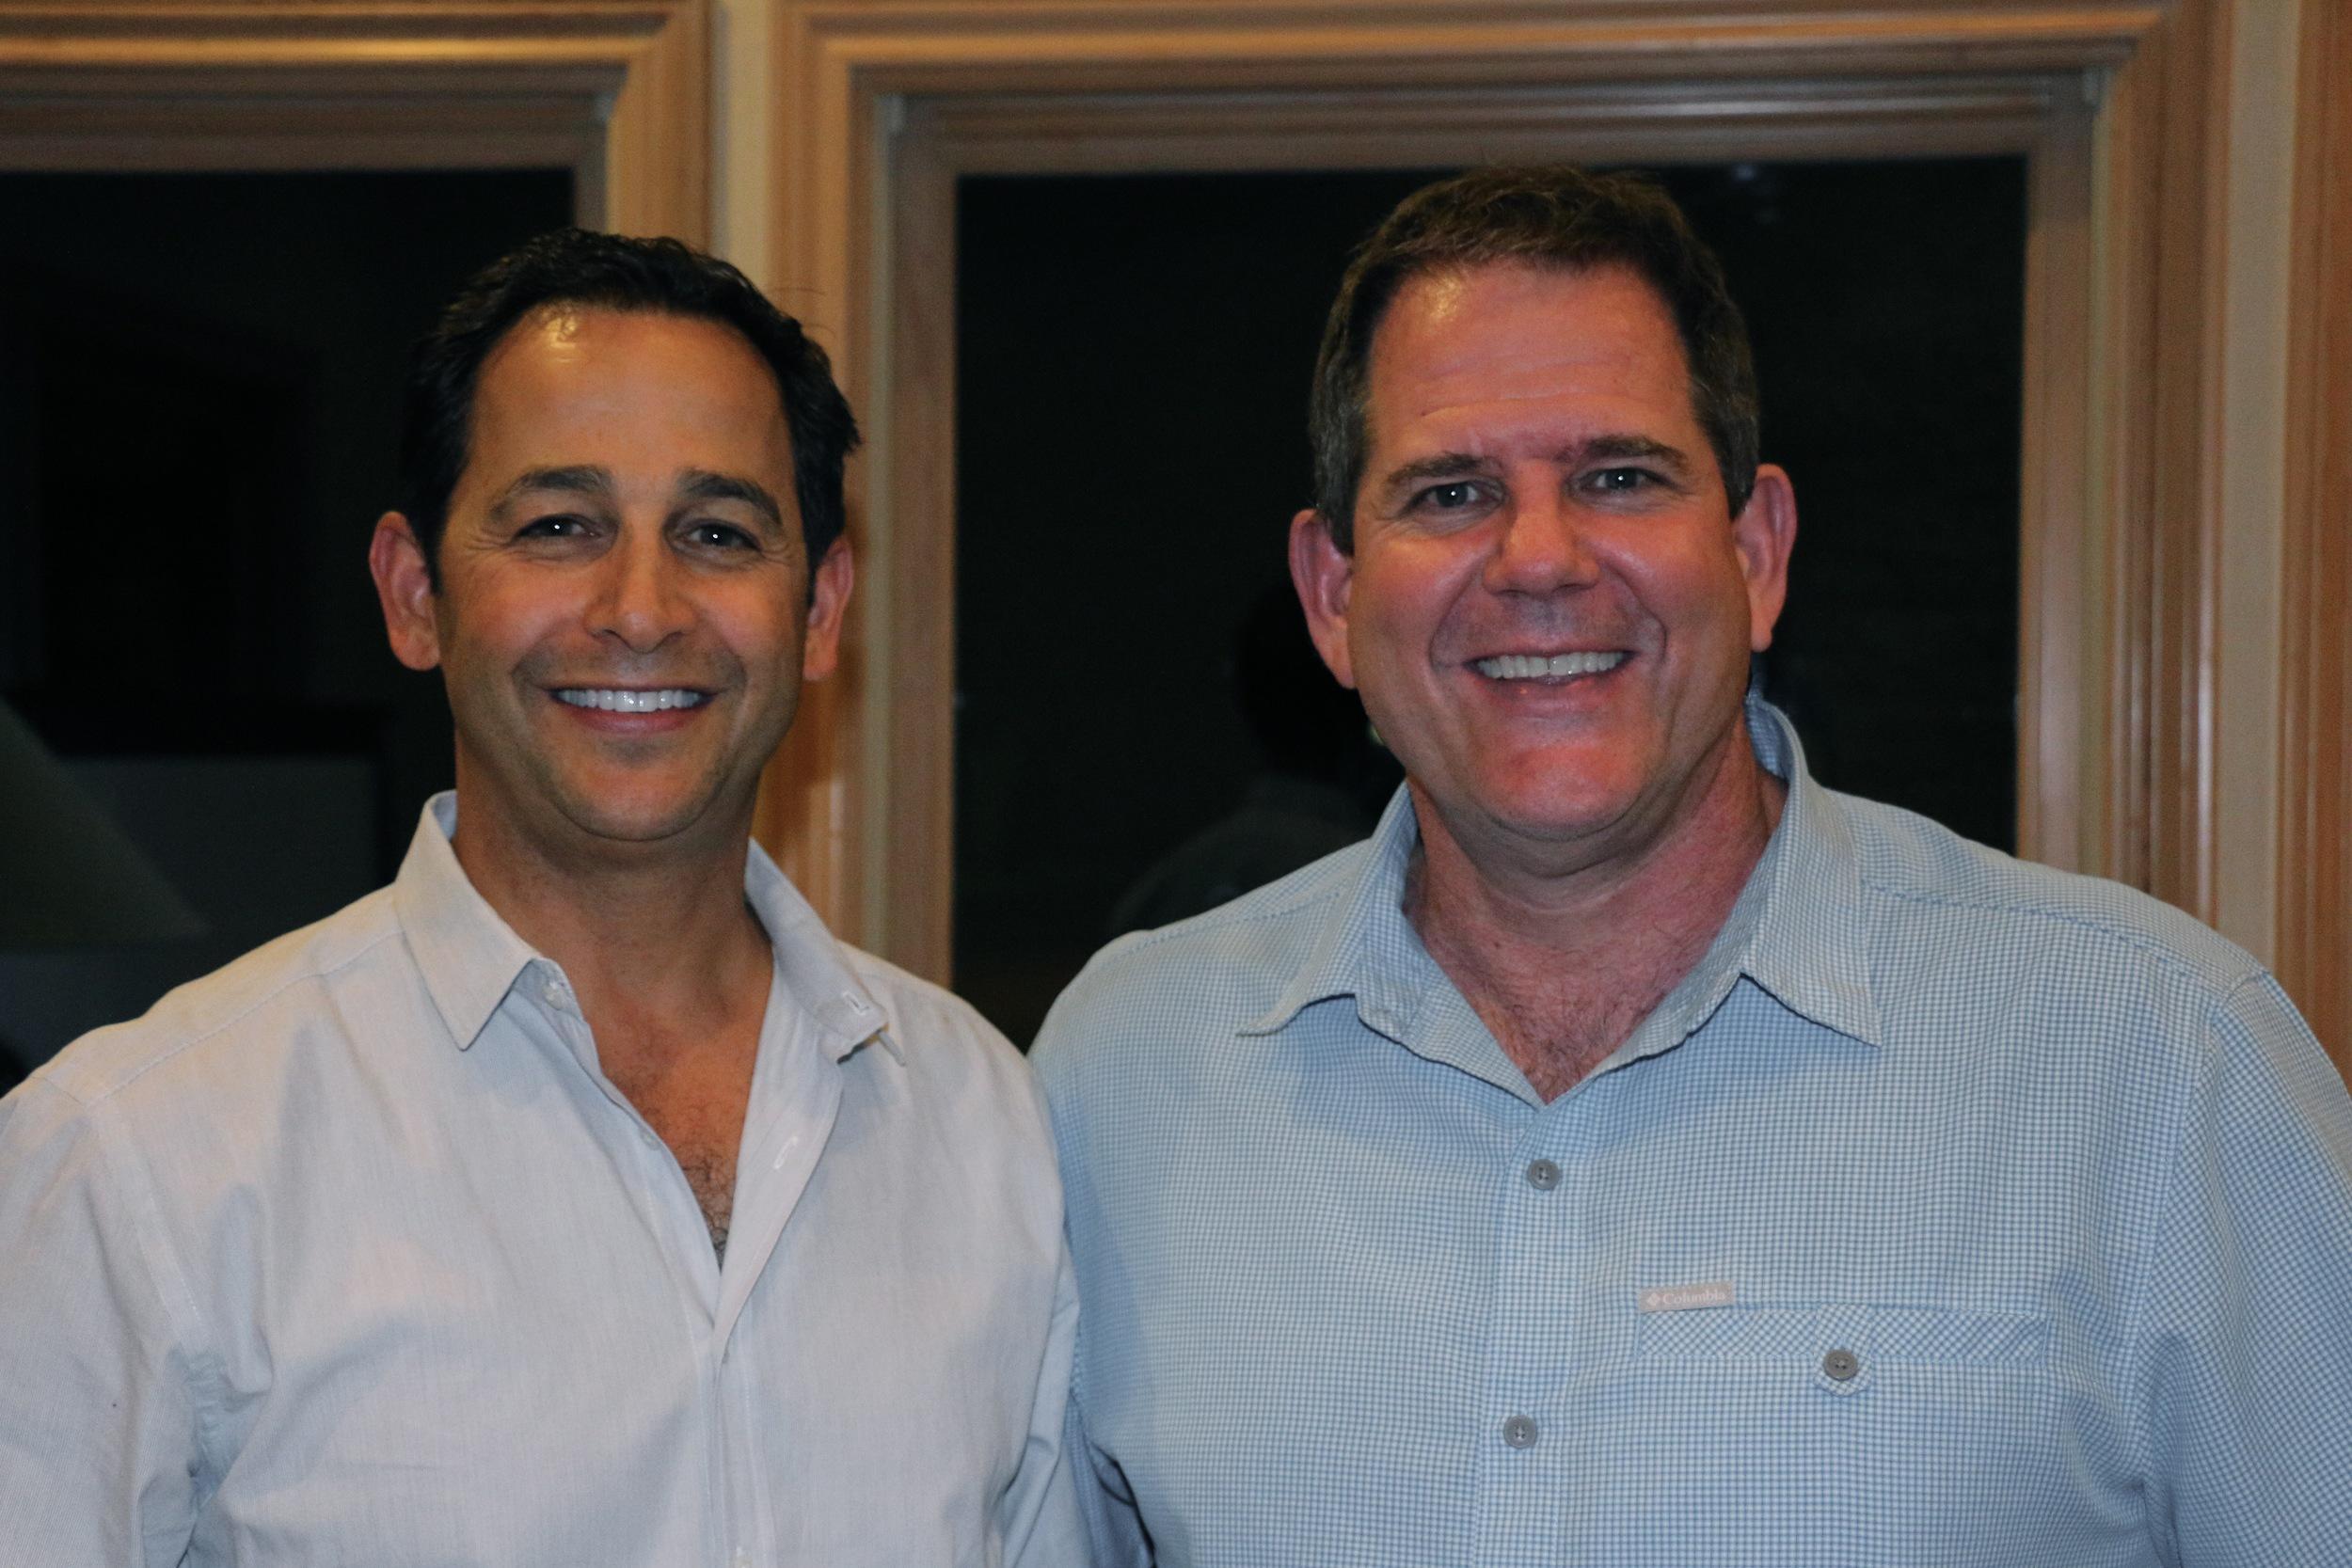 Drs. Randy Kunik and David Hime